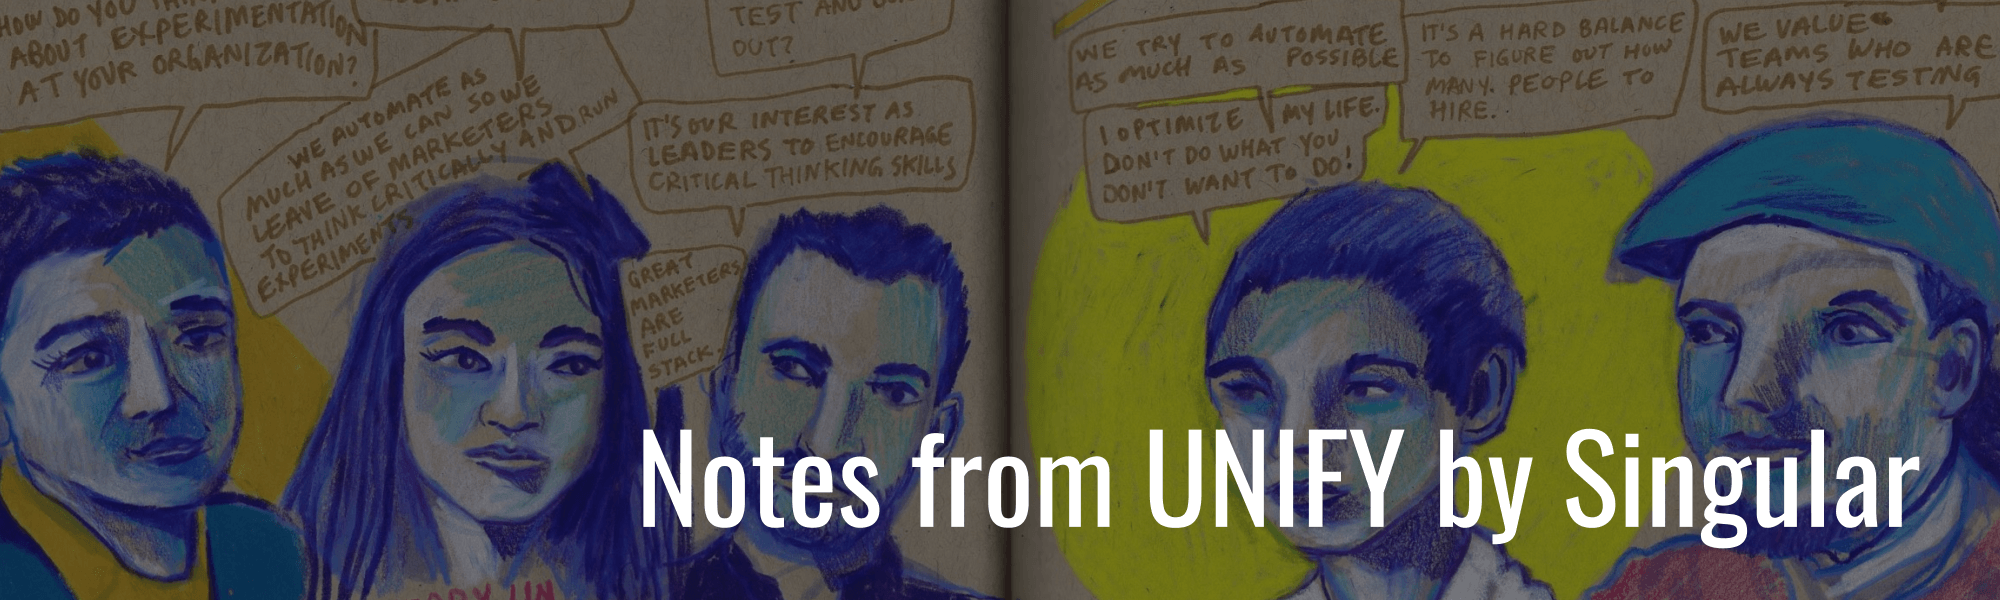 notes-from -unify-singular-illuminated-notes-case-study-late-nite-art